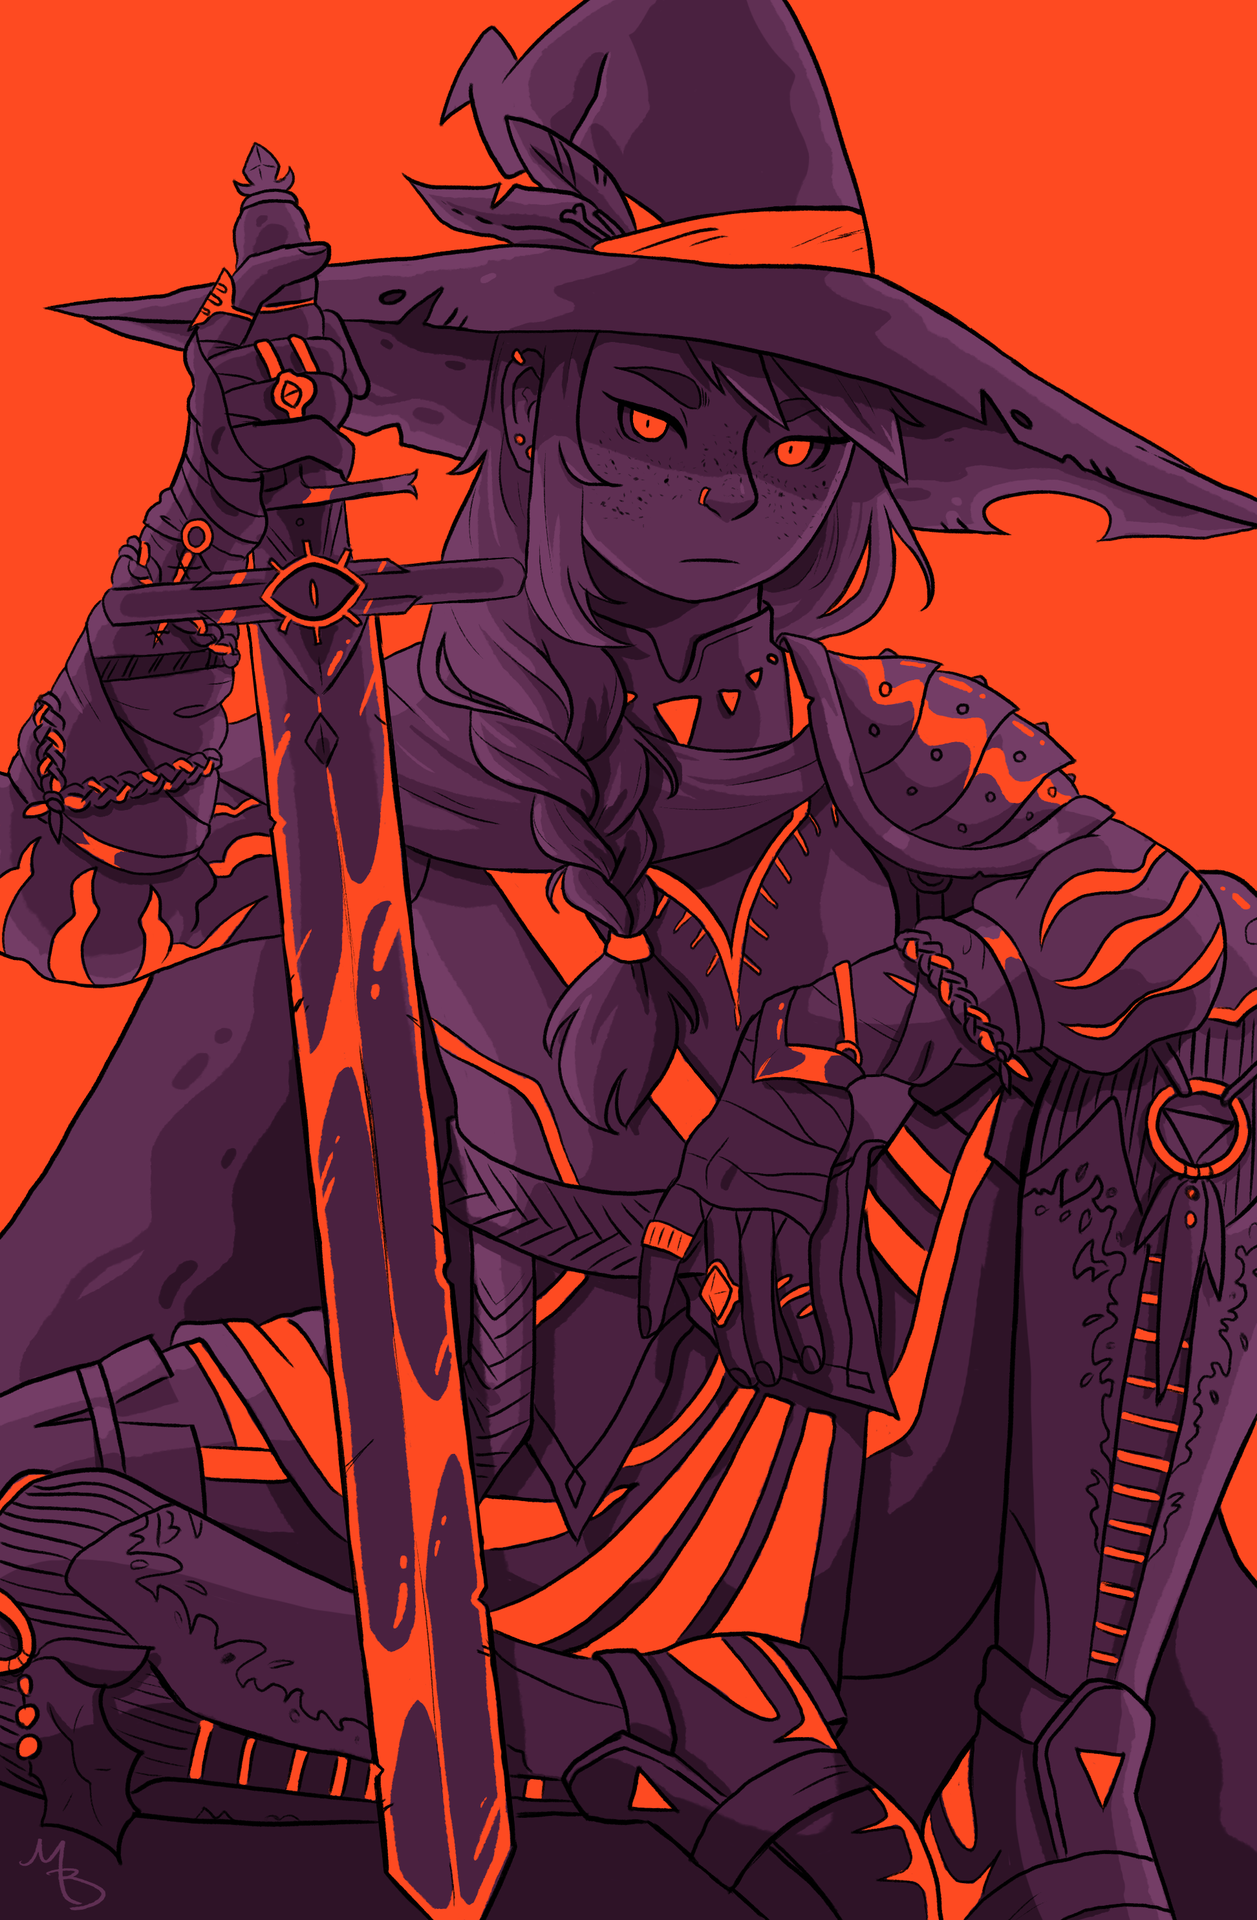 ᕦ(ò óˇ)ᕤ Photo (With images) Autumn witch, Illustration